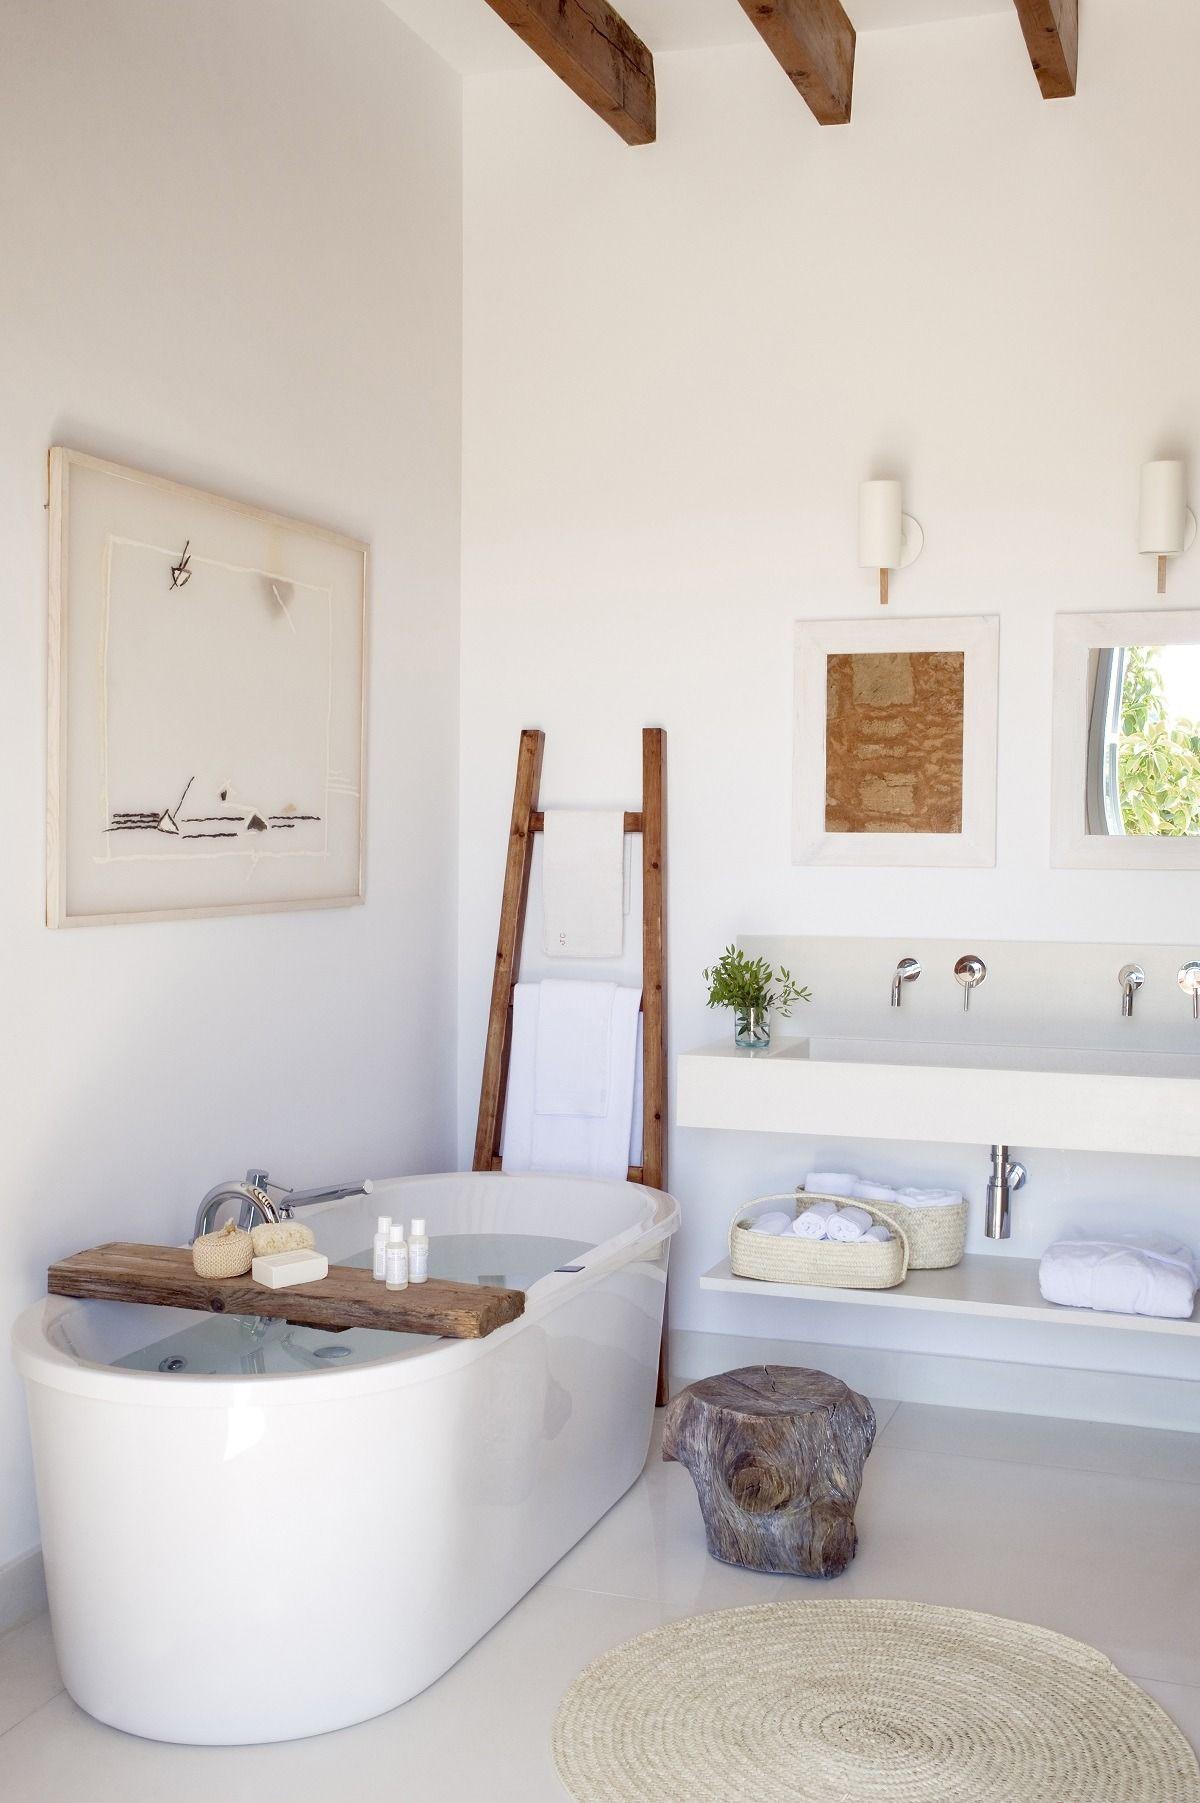 30 Bathroom Ideas Stolen From Hotels | Pinterest | House, Bath and ...